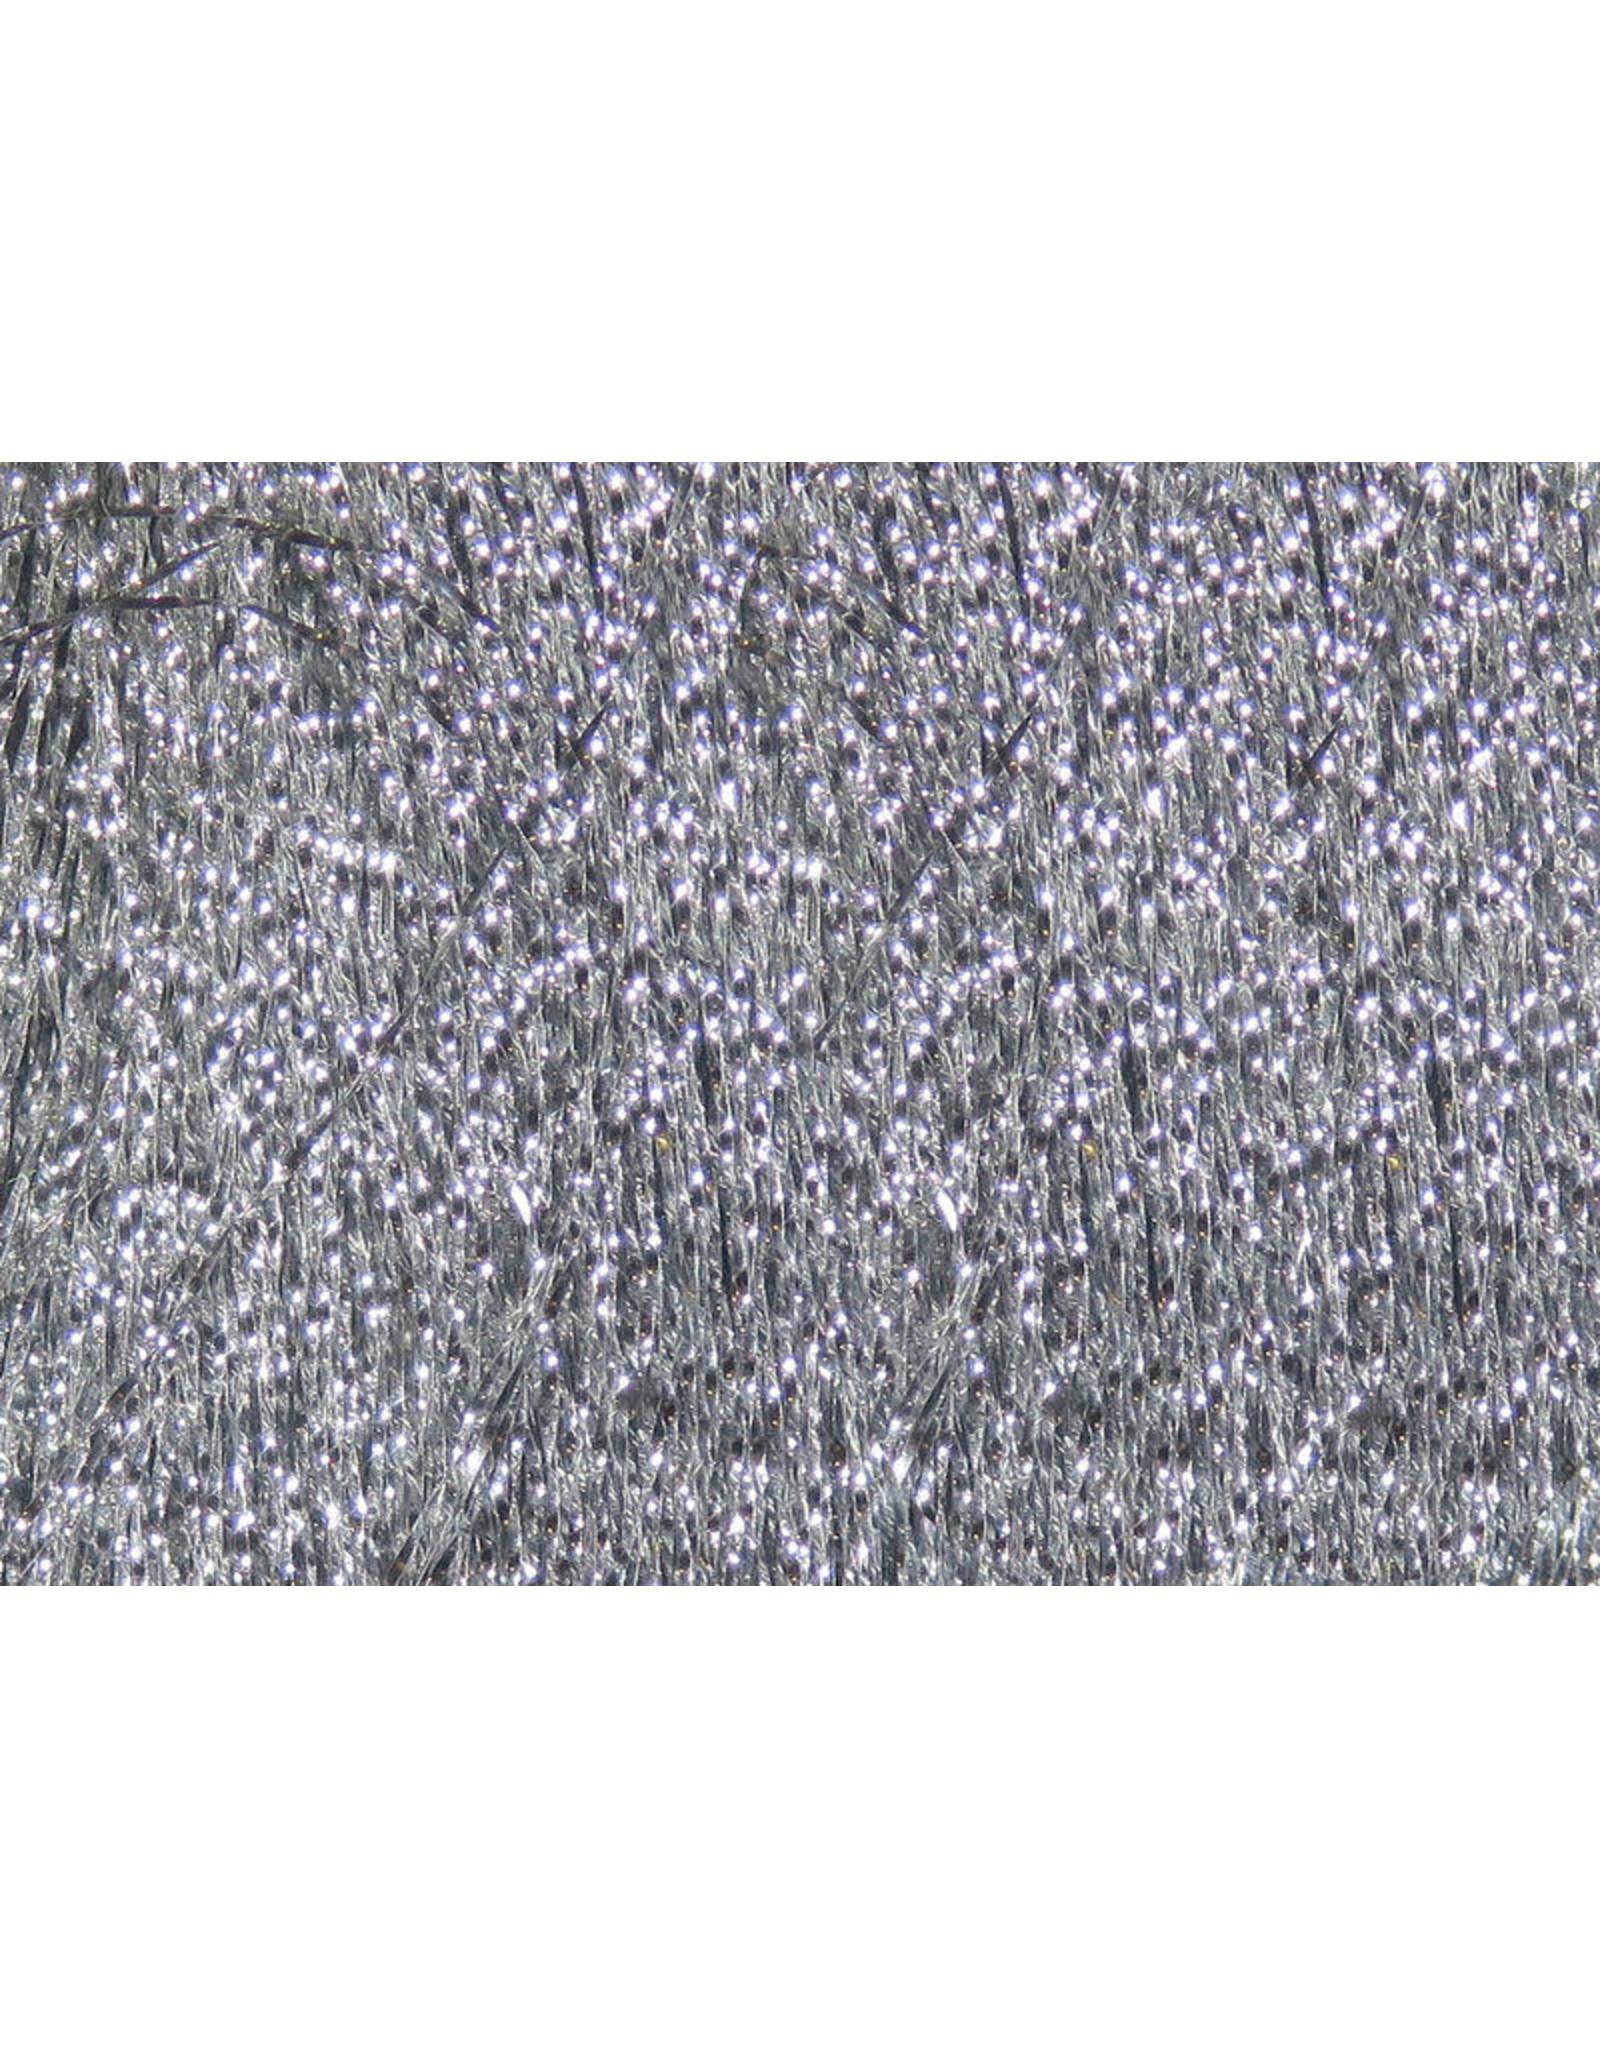 Hareline Krystal Flash - Silver #1